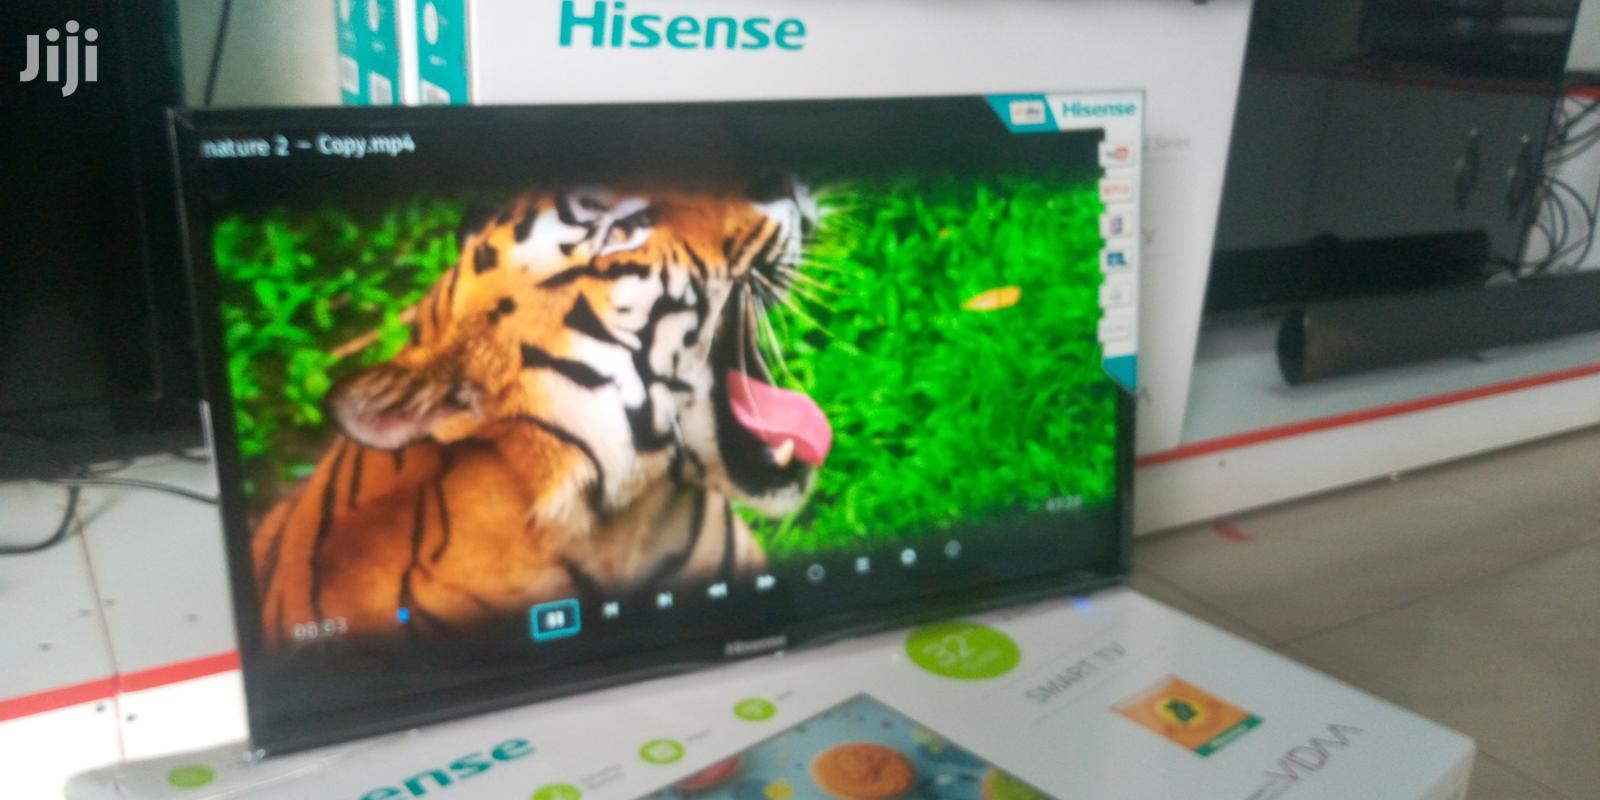 Archive: 32 Inches Led Hisense Smart Flat Screen